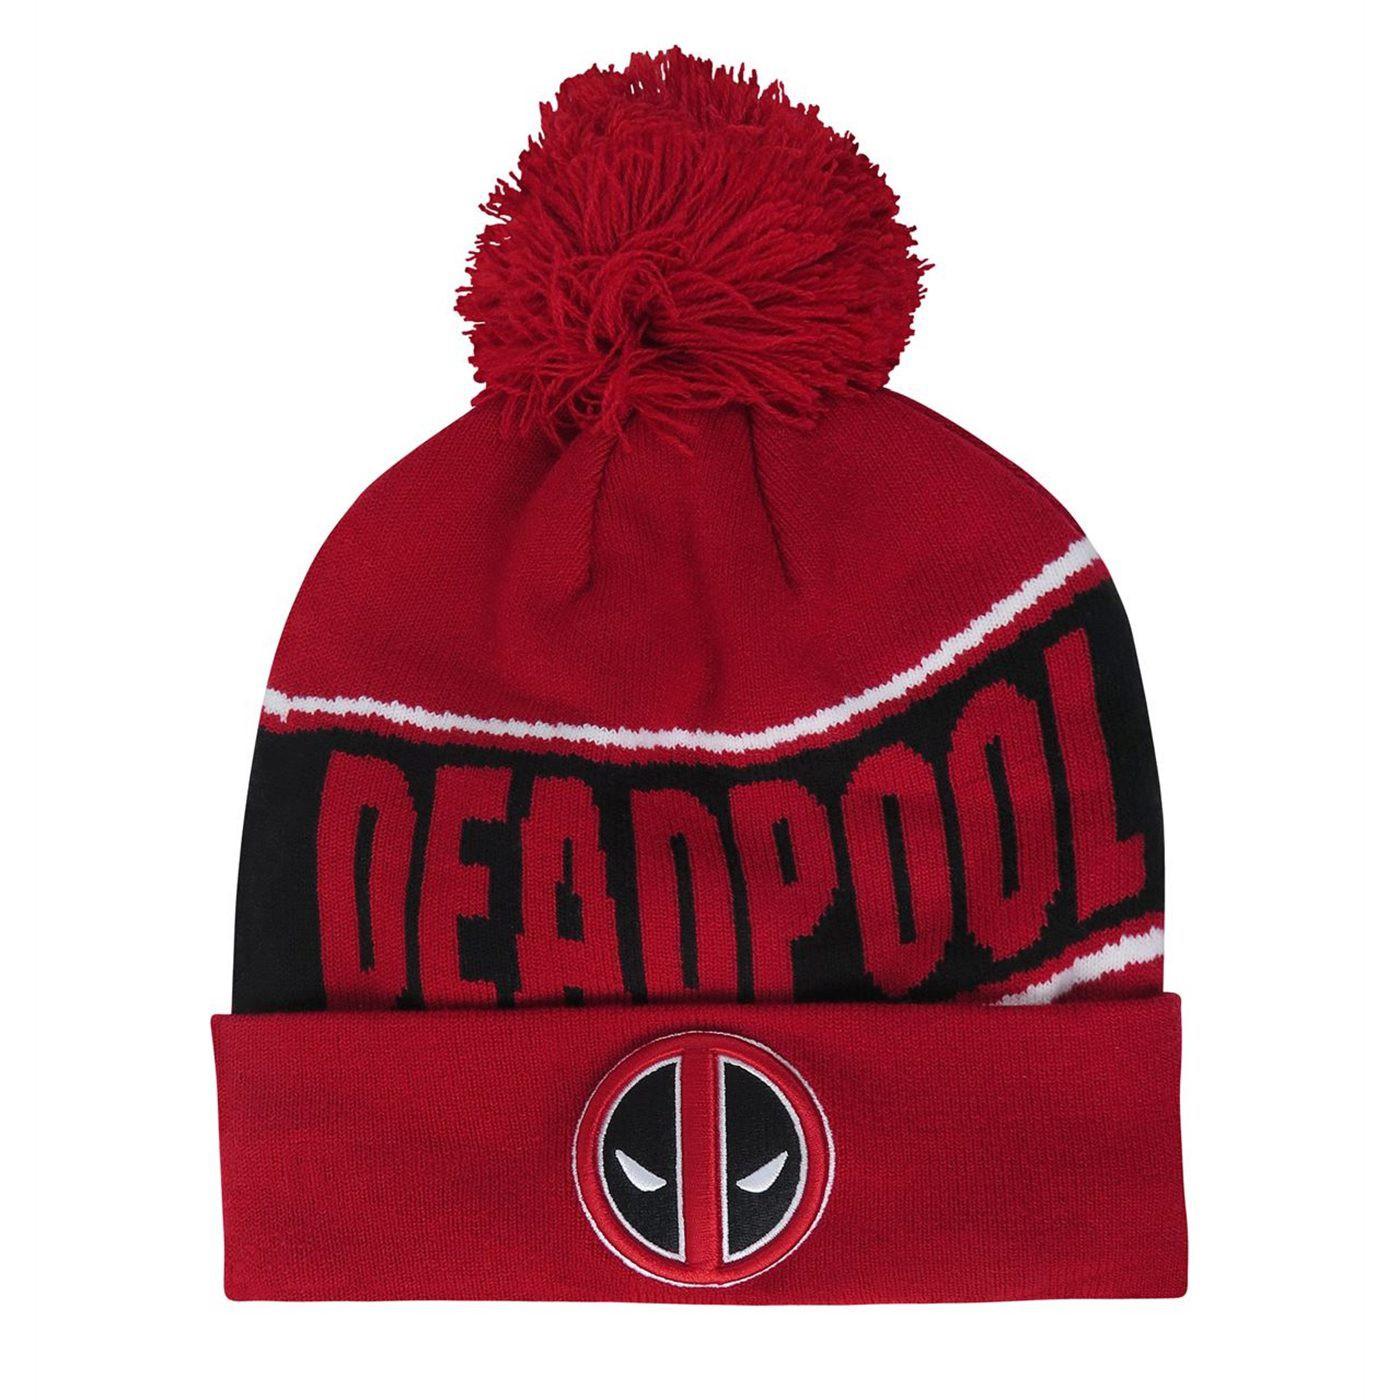 Deadpool Fleece Lined Pom Pom Beanie